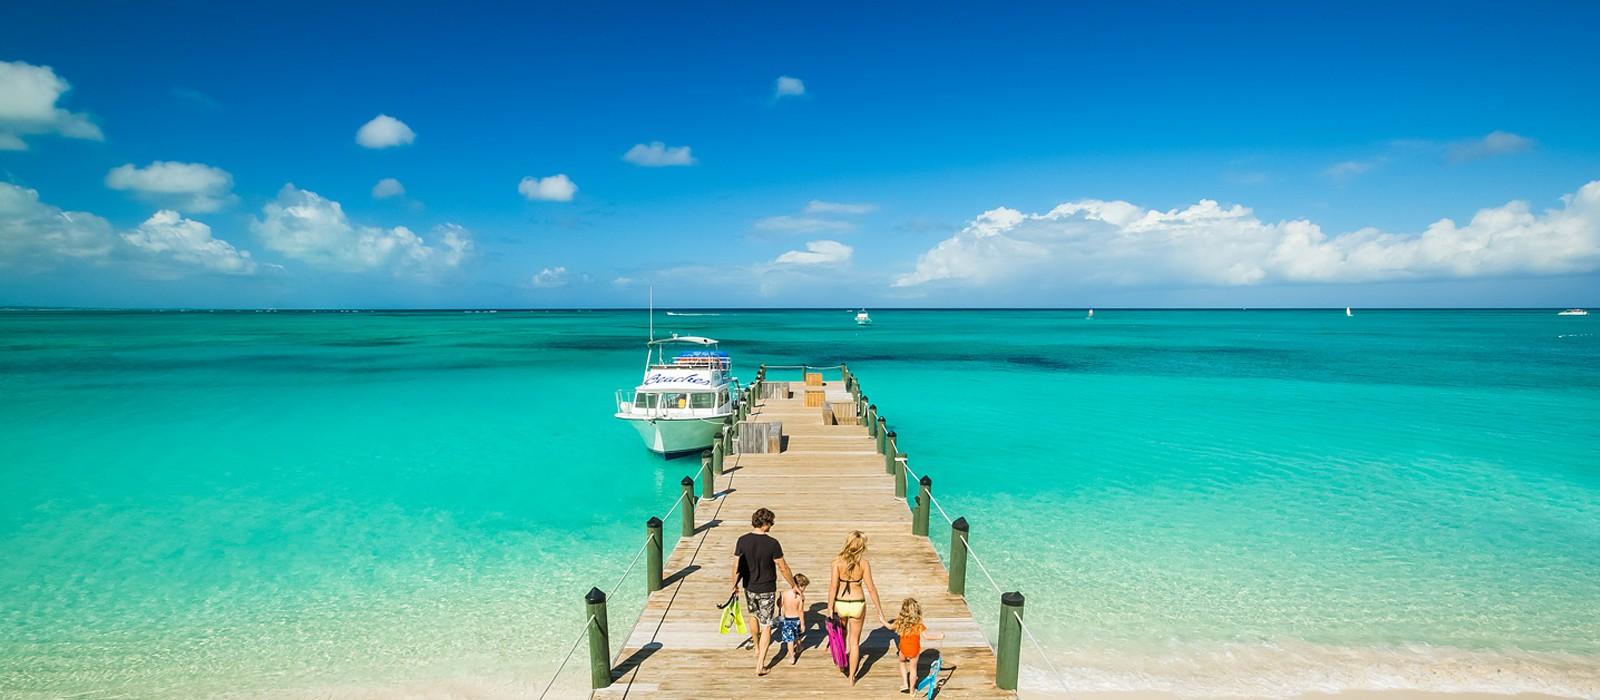 Beaches Turks - Luxury Caribbean Holidays - header